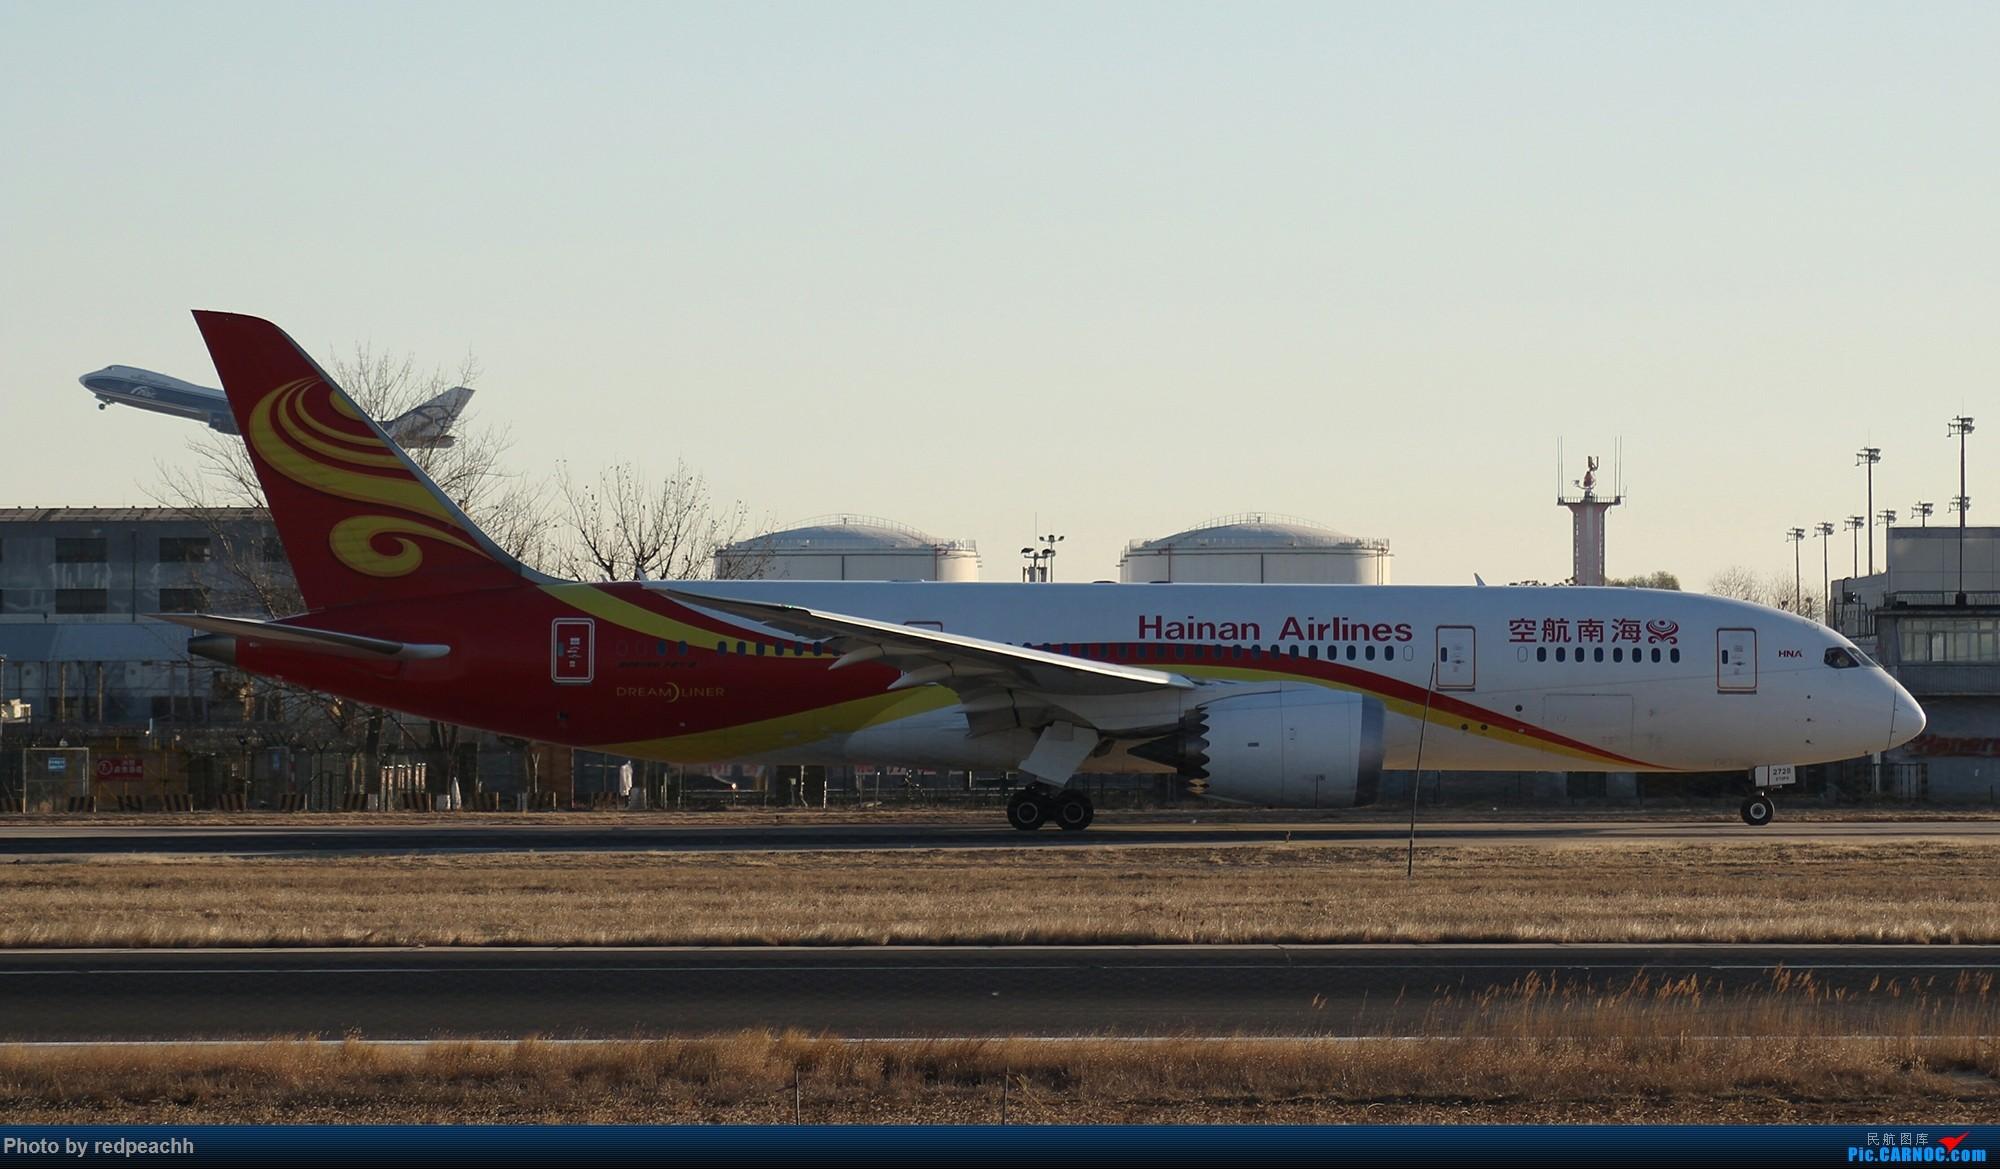 Re:[原创]河北人为拍机而首都机场2日游虽常规但值得纪念(36L) BOEING 787-8  中国北京首都国际机场